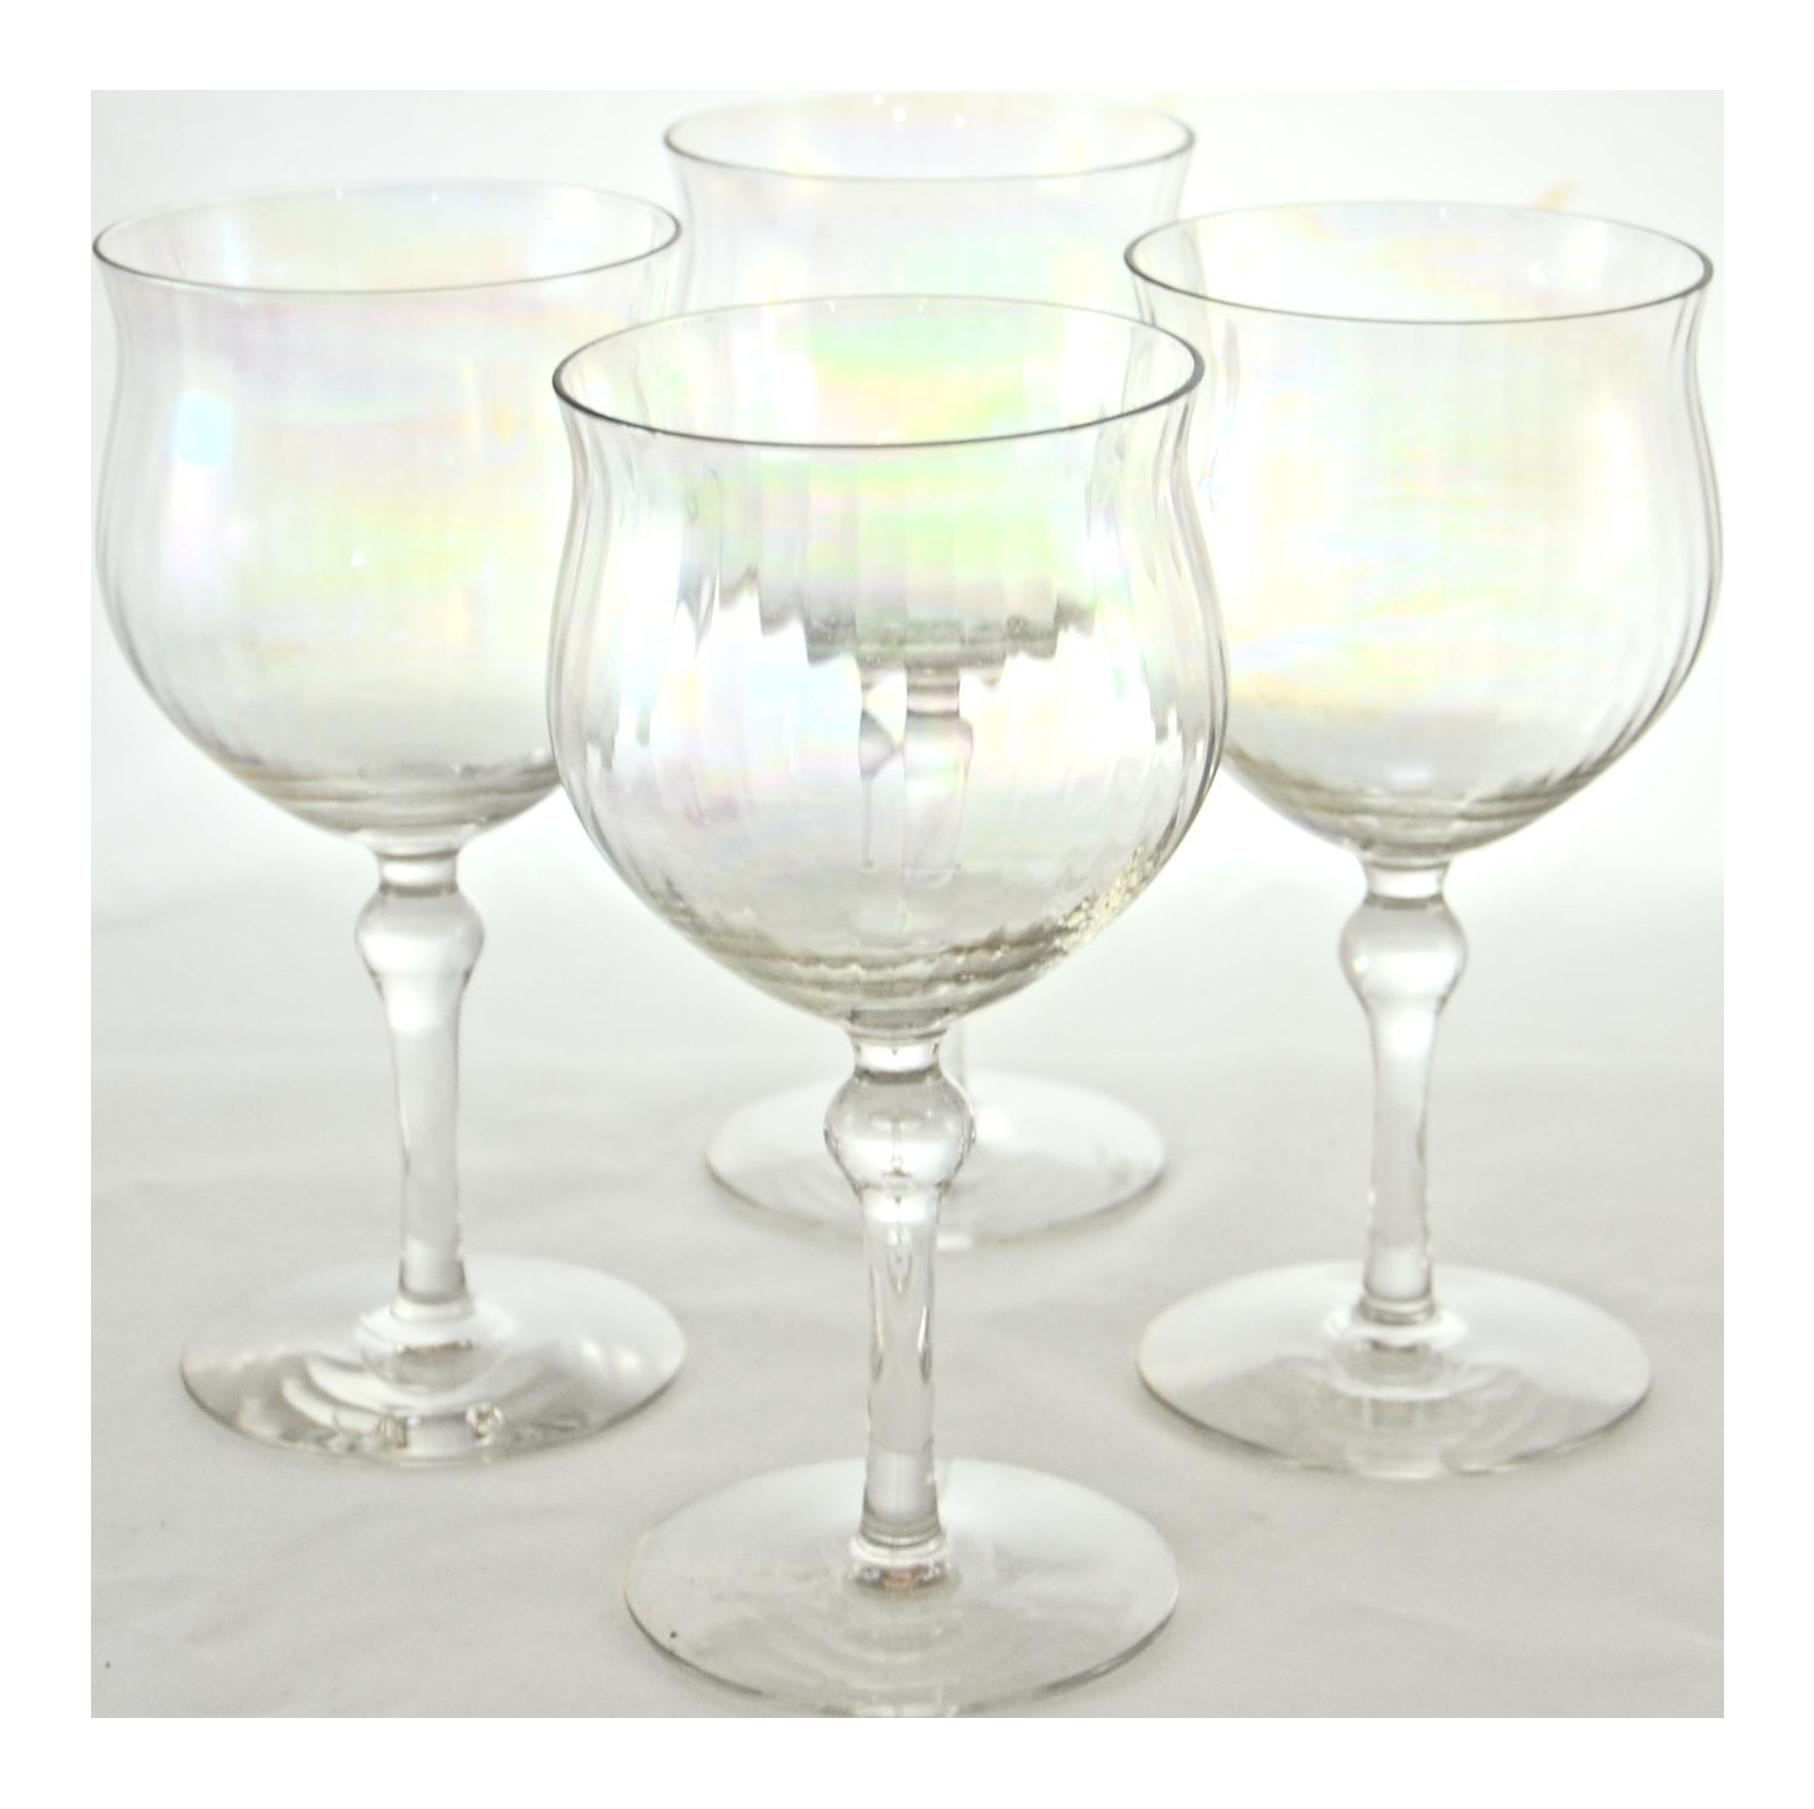 Iridescent Optic Crystal Stemmed Wine Glasses Set Of 4